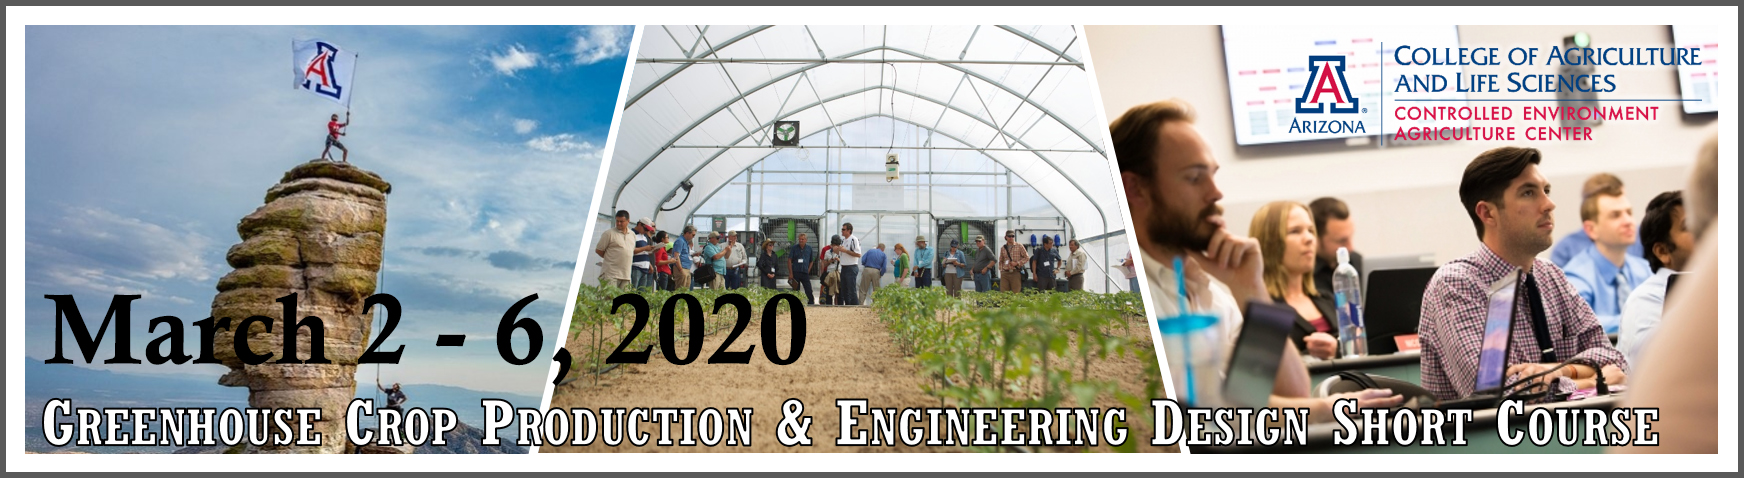 2020 Short Course